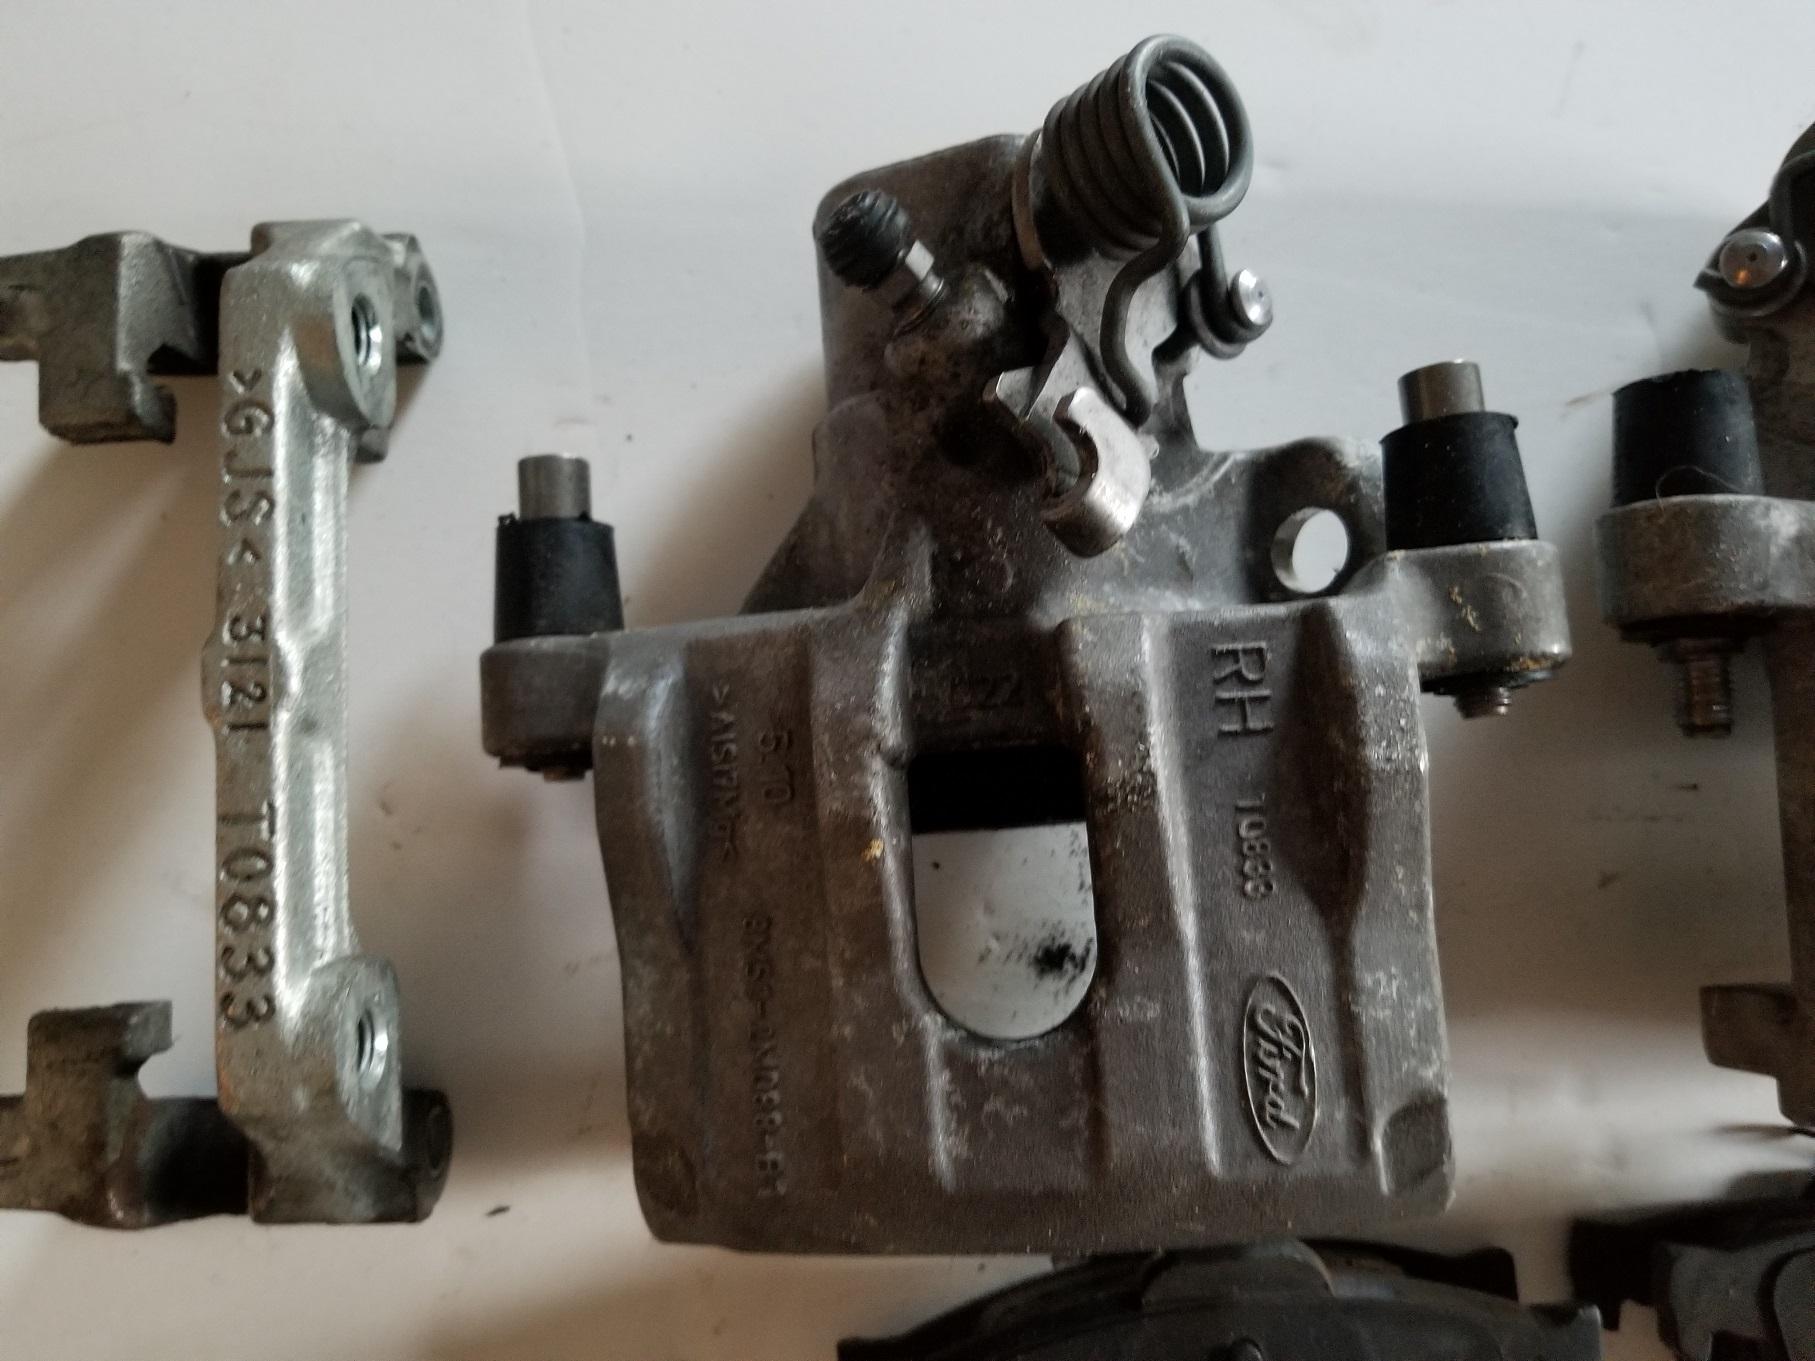 Massive Rear Disc Conversion Parts & Rear SVT Calipers-resized-2-1-.jpg